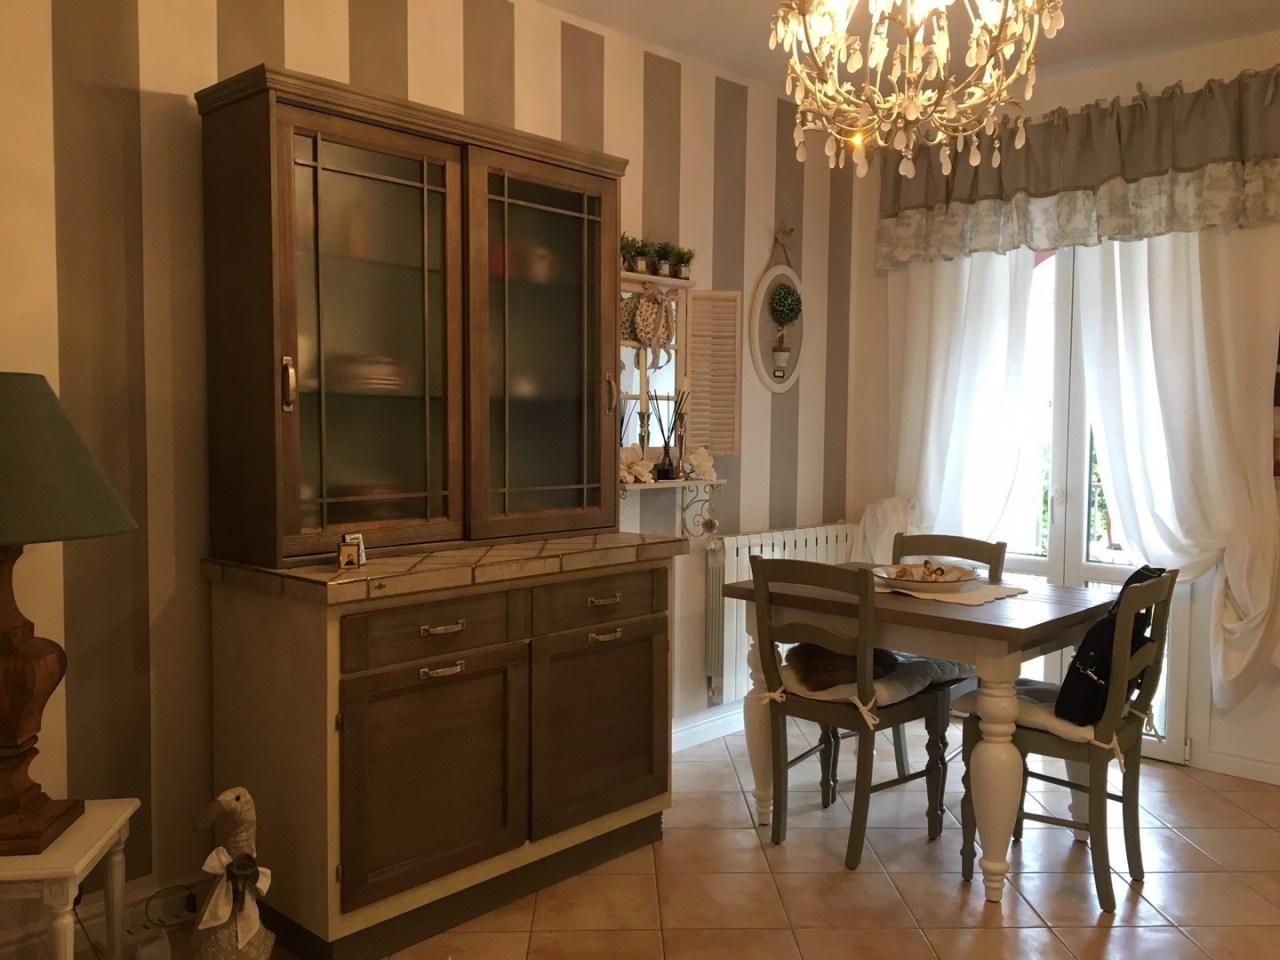 Casa Indipendente in ottime condizioni in vendita Rif. 6576780